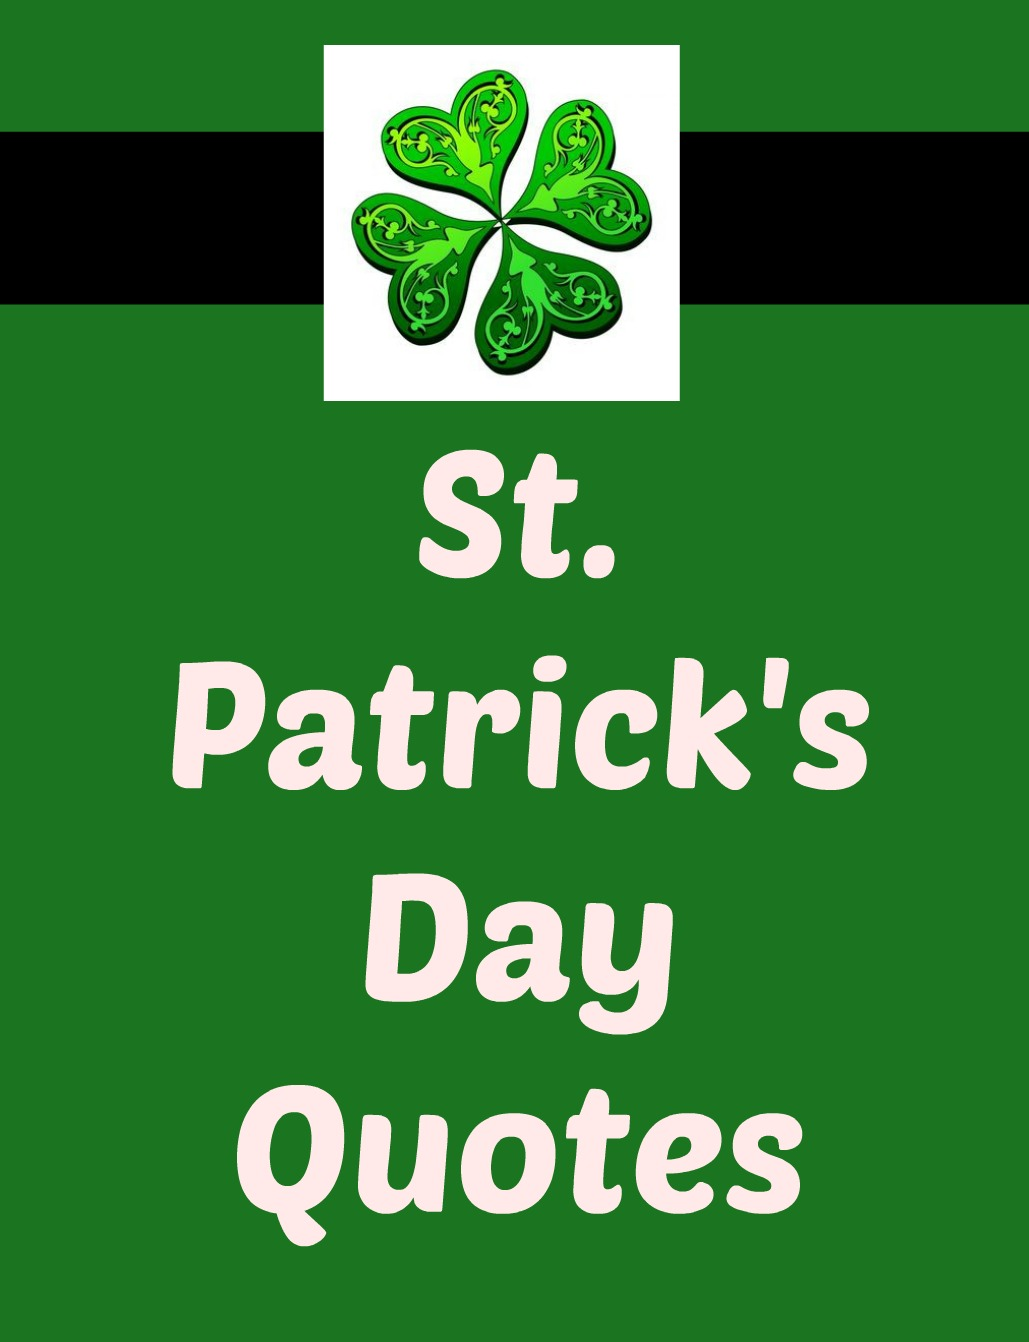 St. Patrick\'s Day Quotes - Joyful Quotes